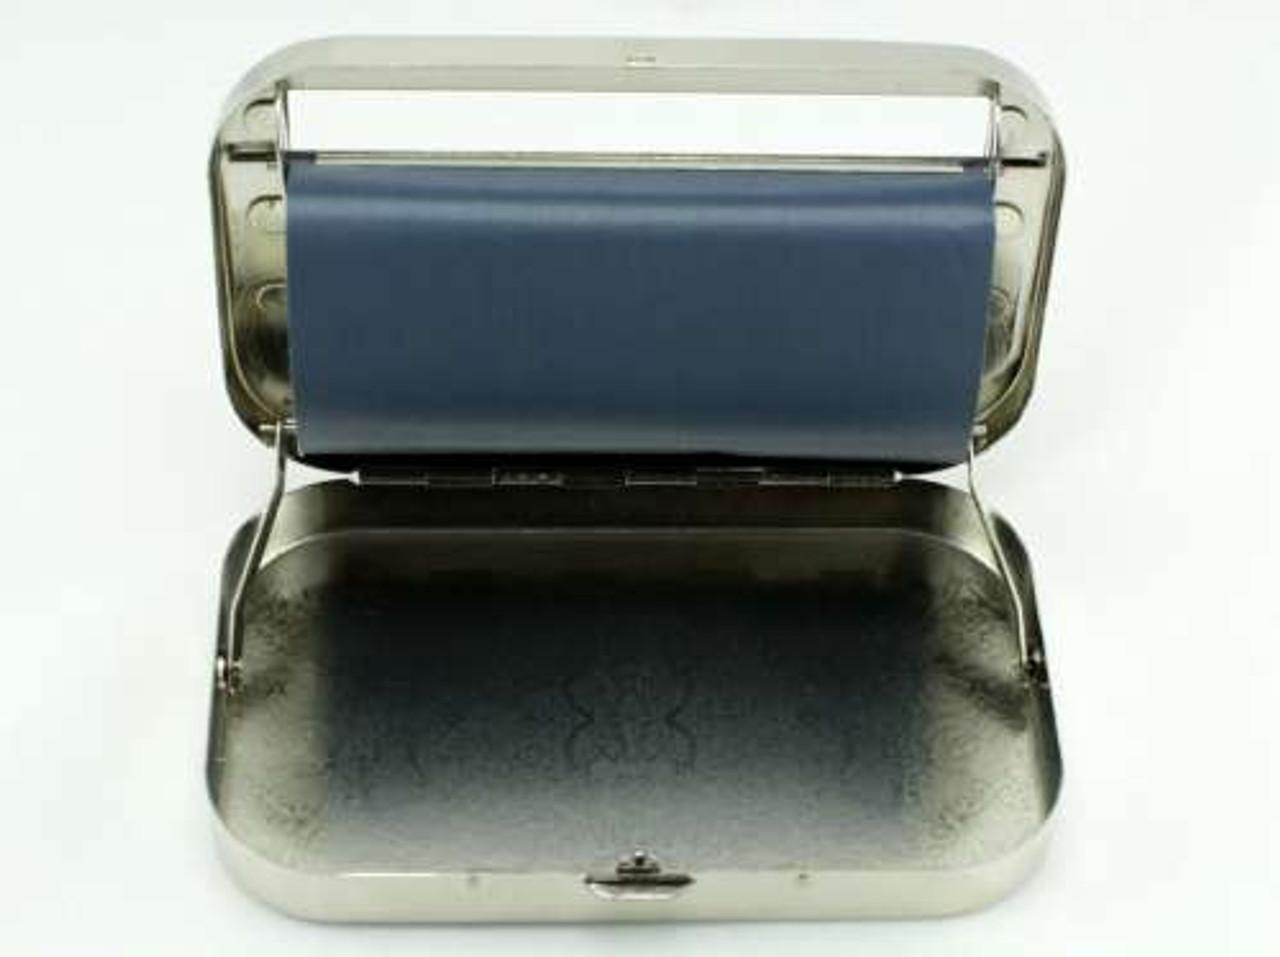 Silver Sunburst 110mm Automatic Cigarette Roller